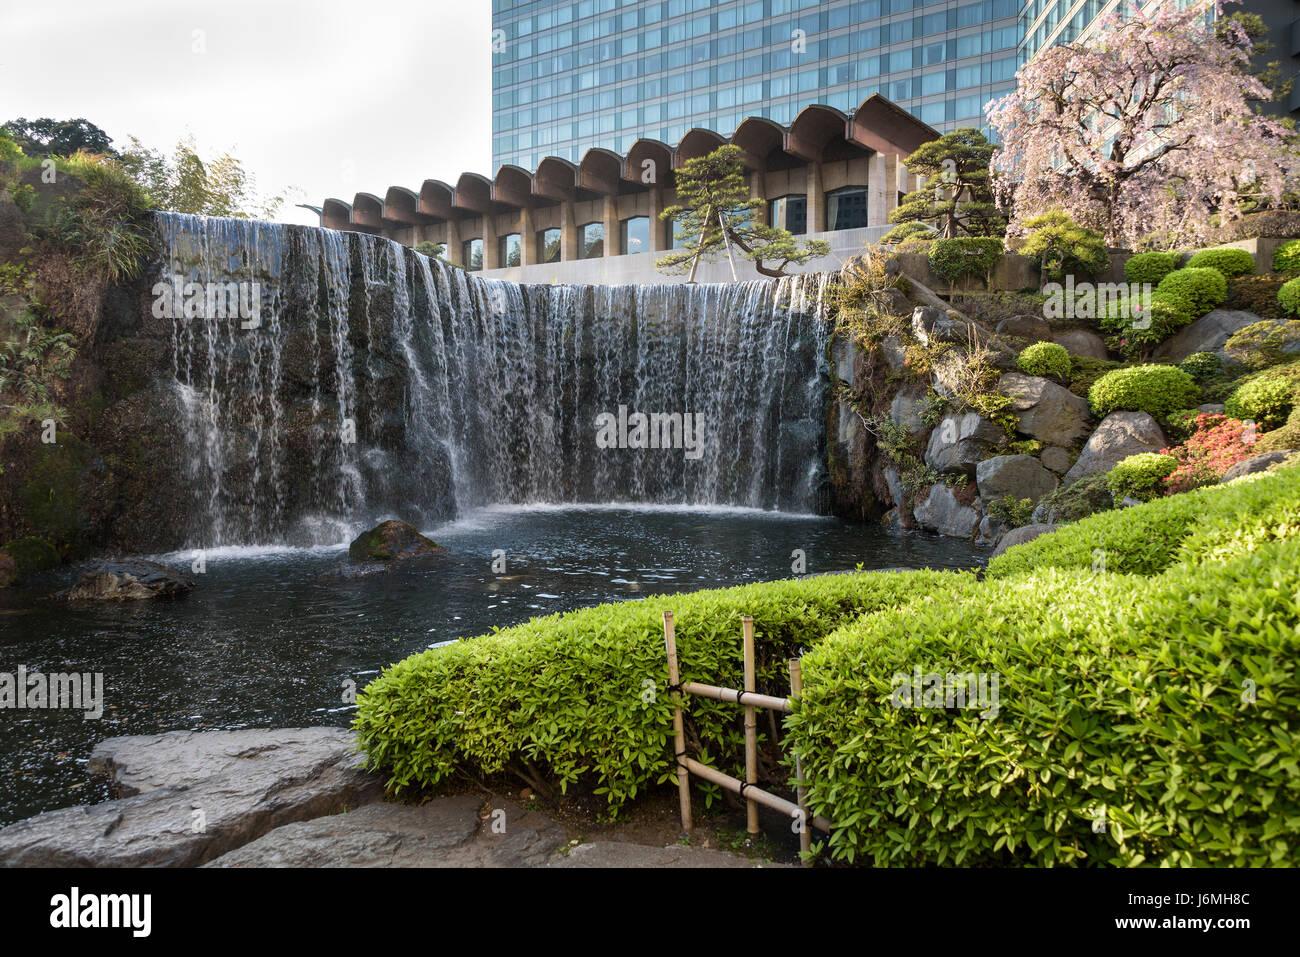 New Otani hotel giardini giapponesi.tipico giardino giapponese nel centro di Tokyo. Immagini Stock